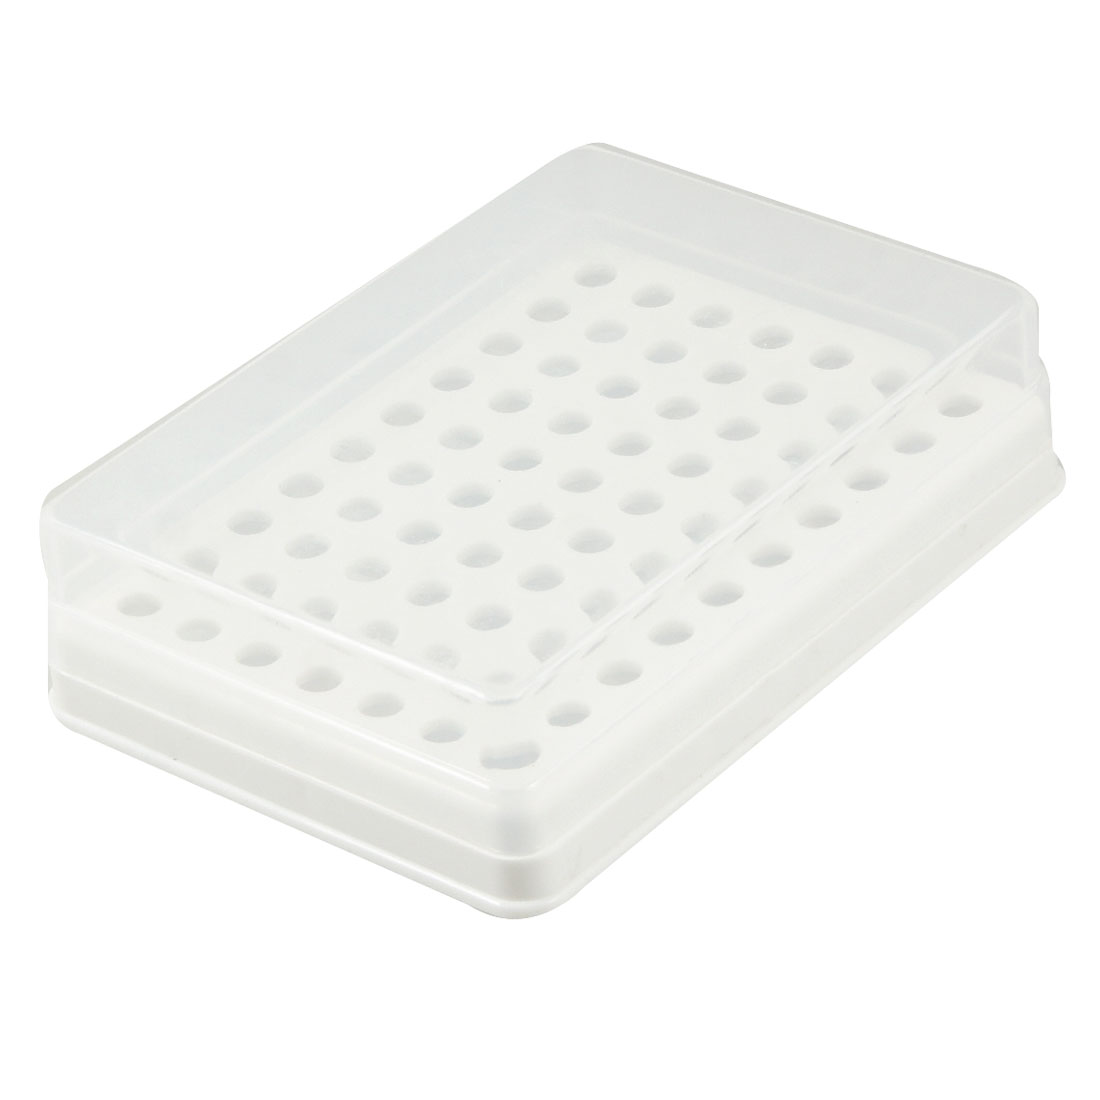 Plastic Rectangular 70 Positions Laboratory 0.2ml Centrifuge Tube Case Box